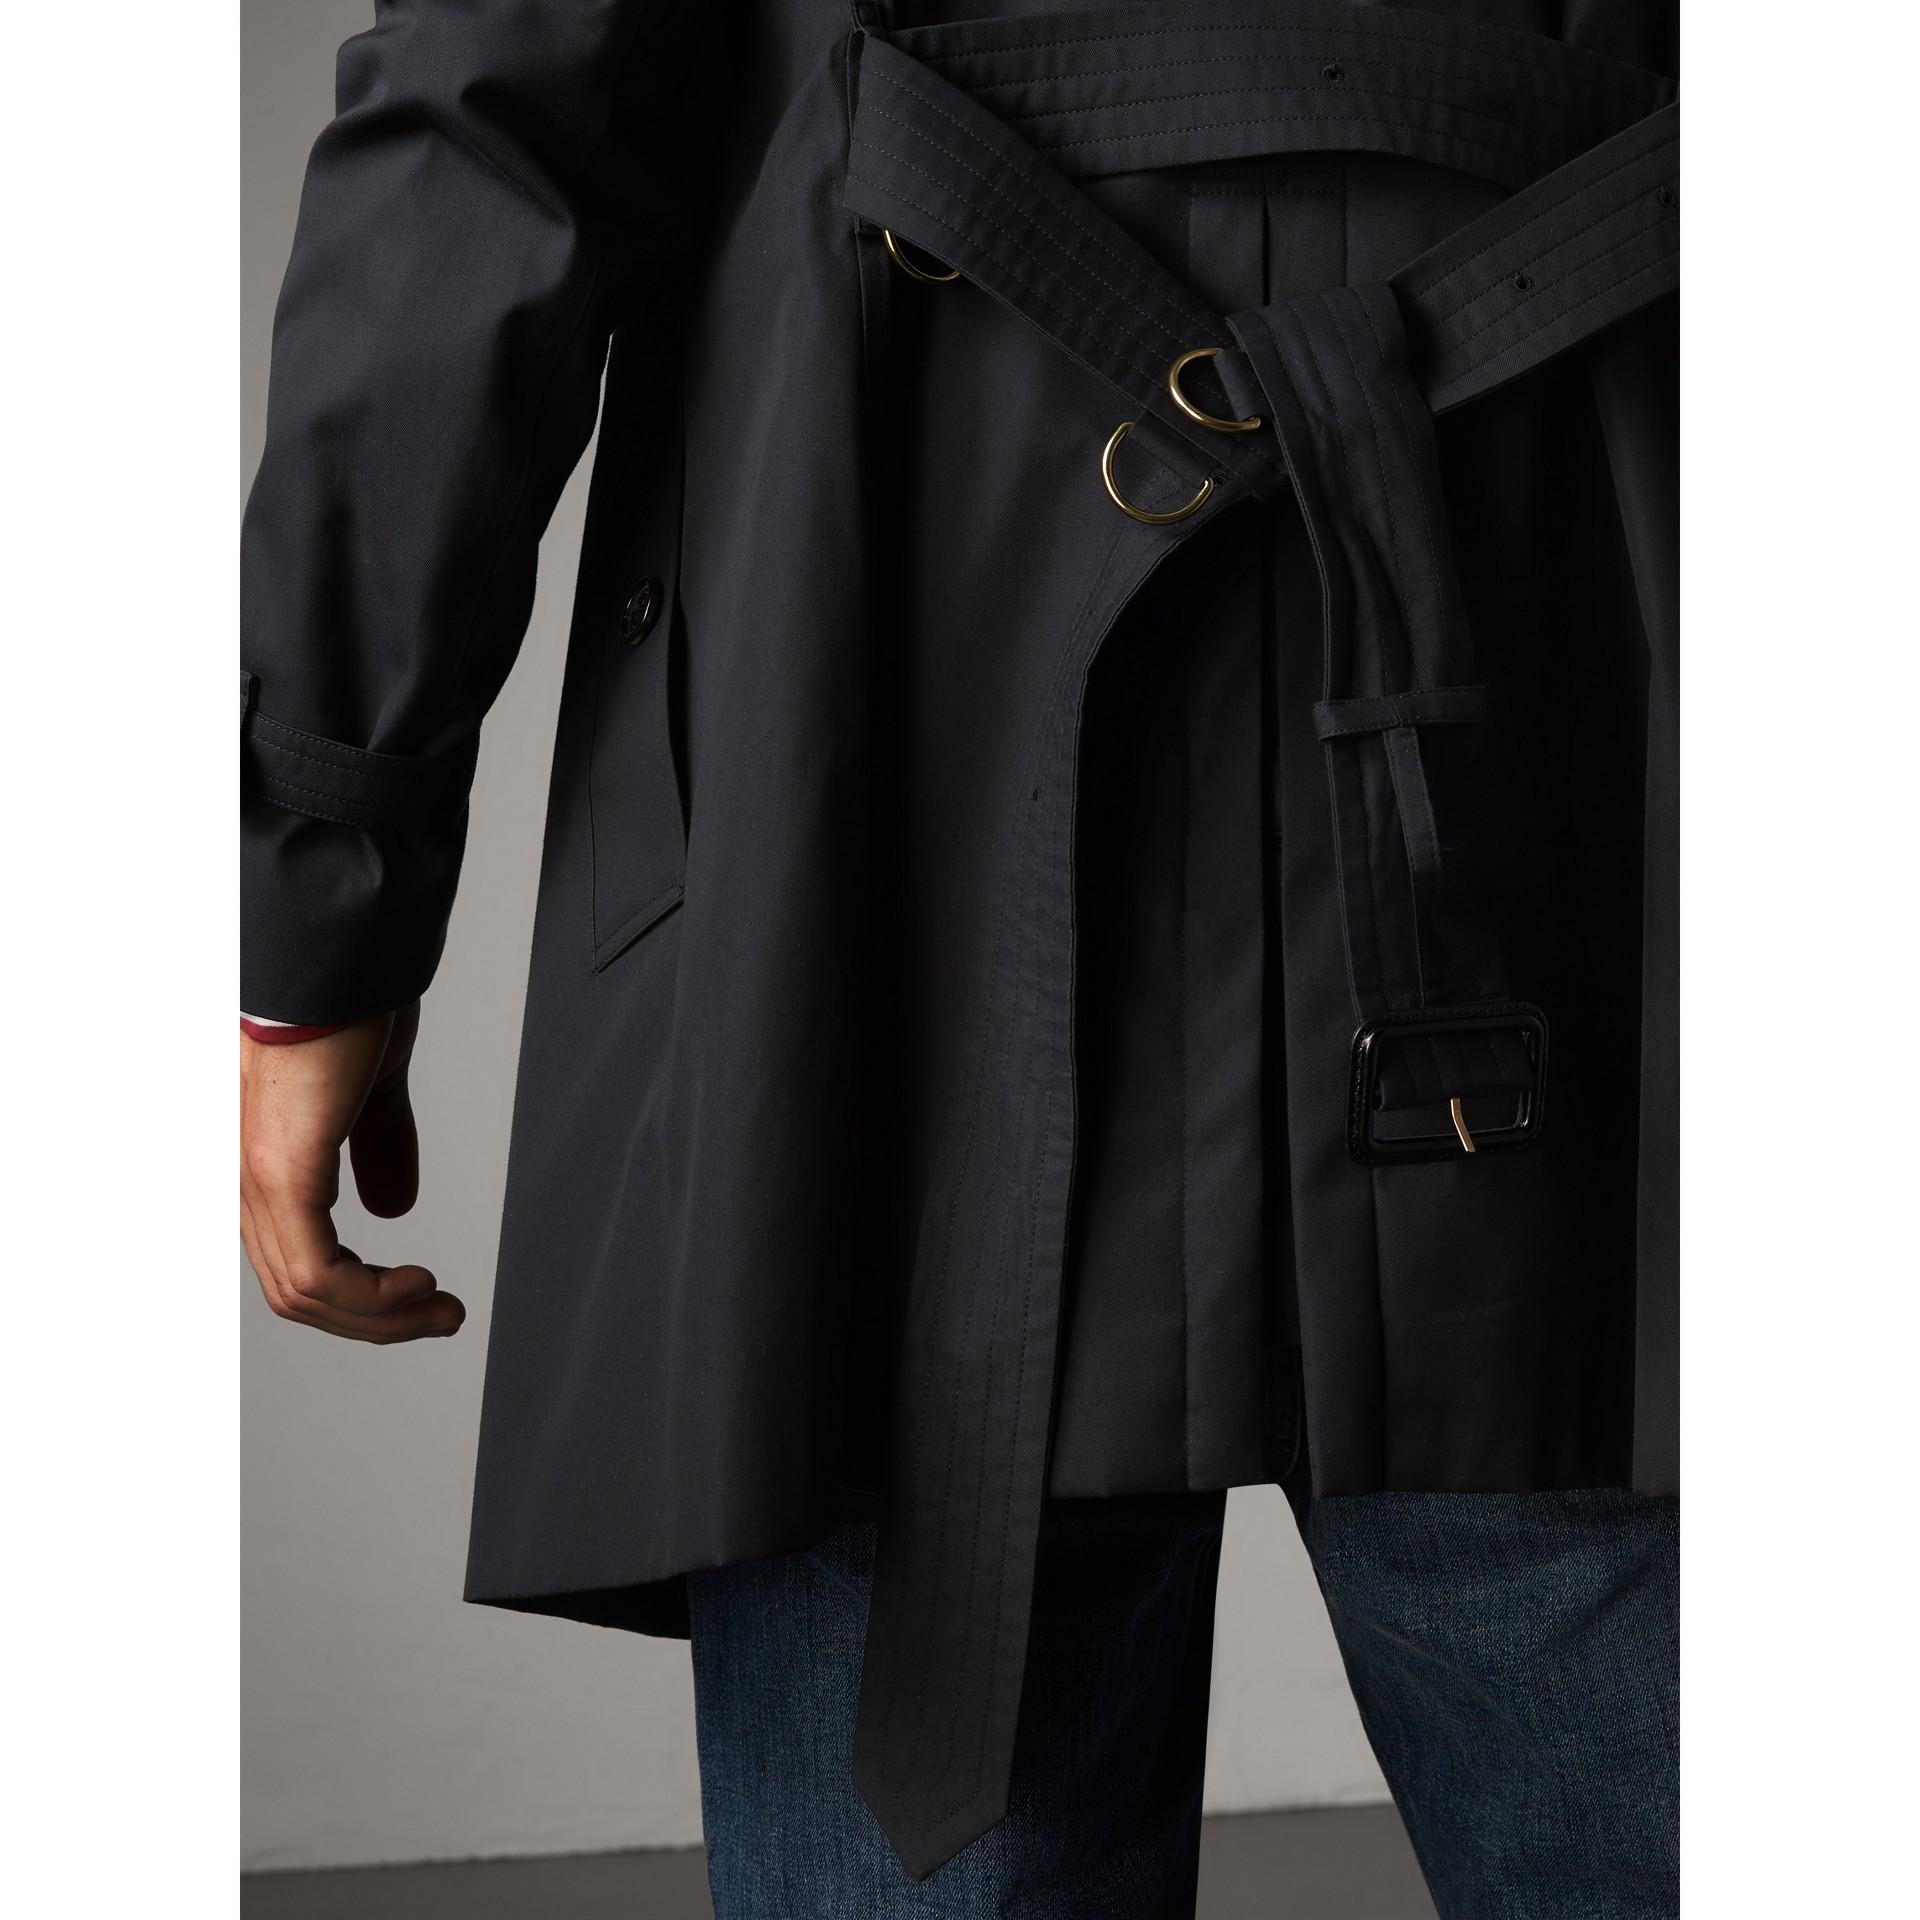 Trench coat Kensington – Trench coat Heritage de longitud media (Azul Marino) - Hombre | Burberry - imagen de la galería 7